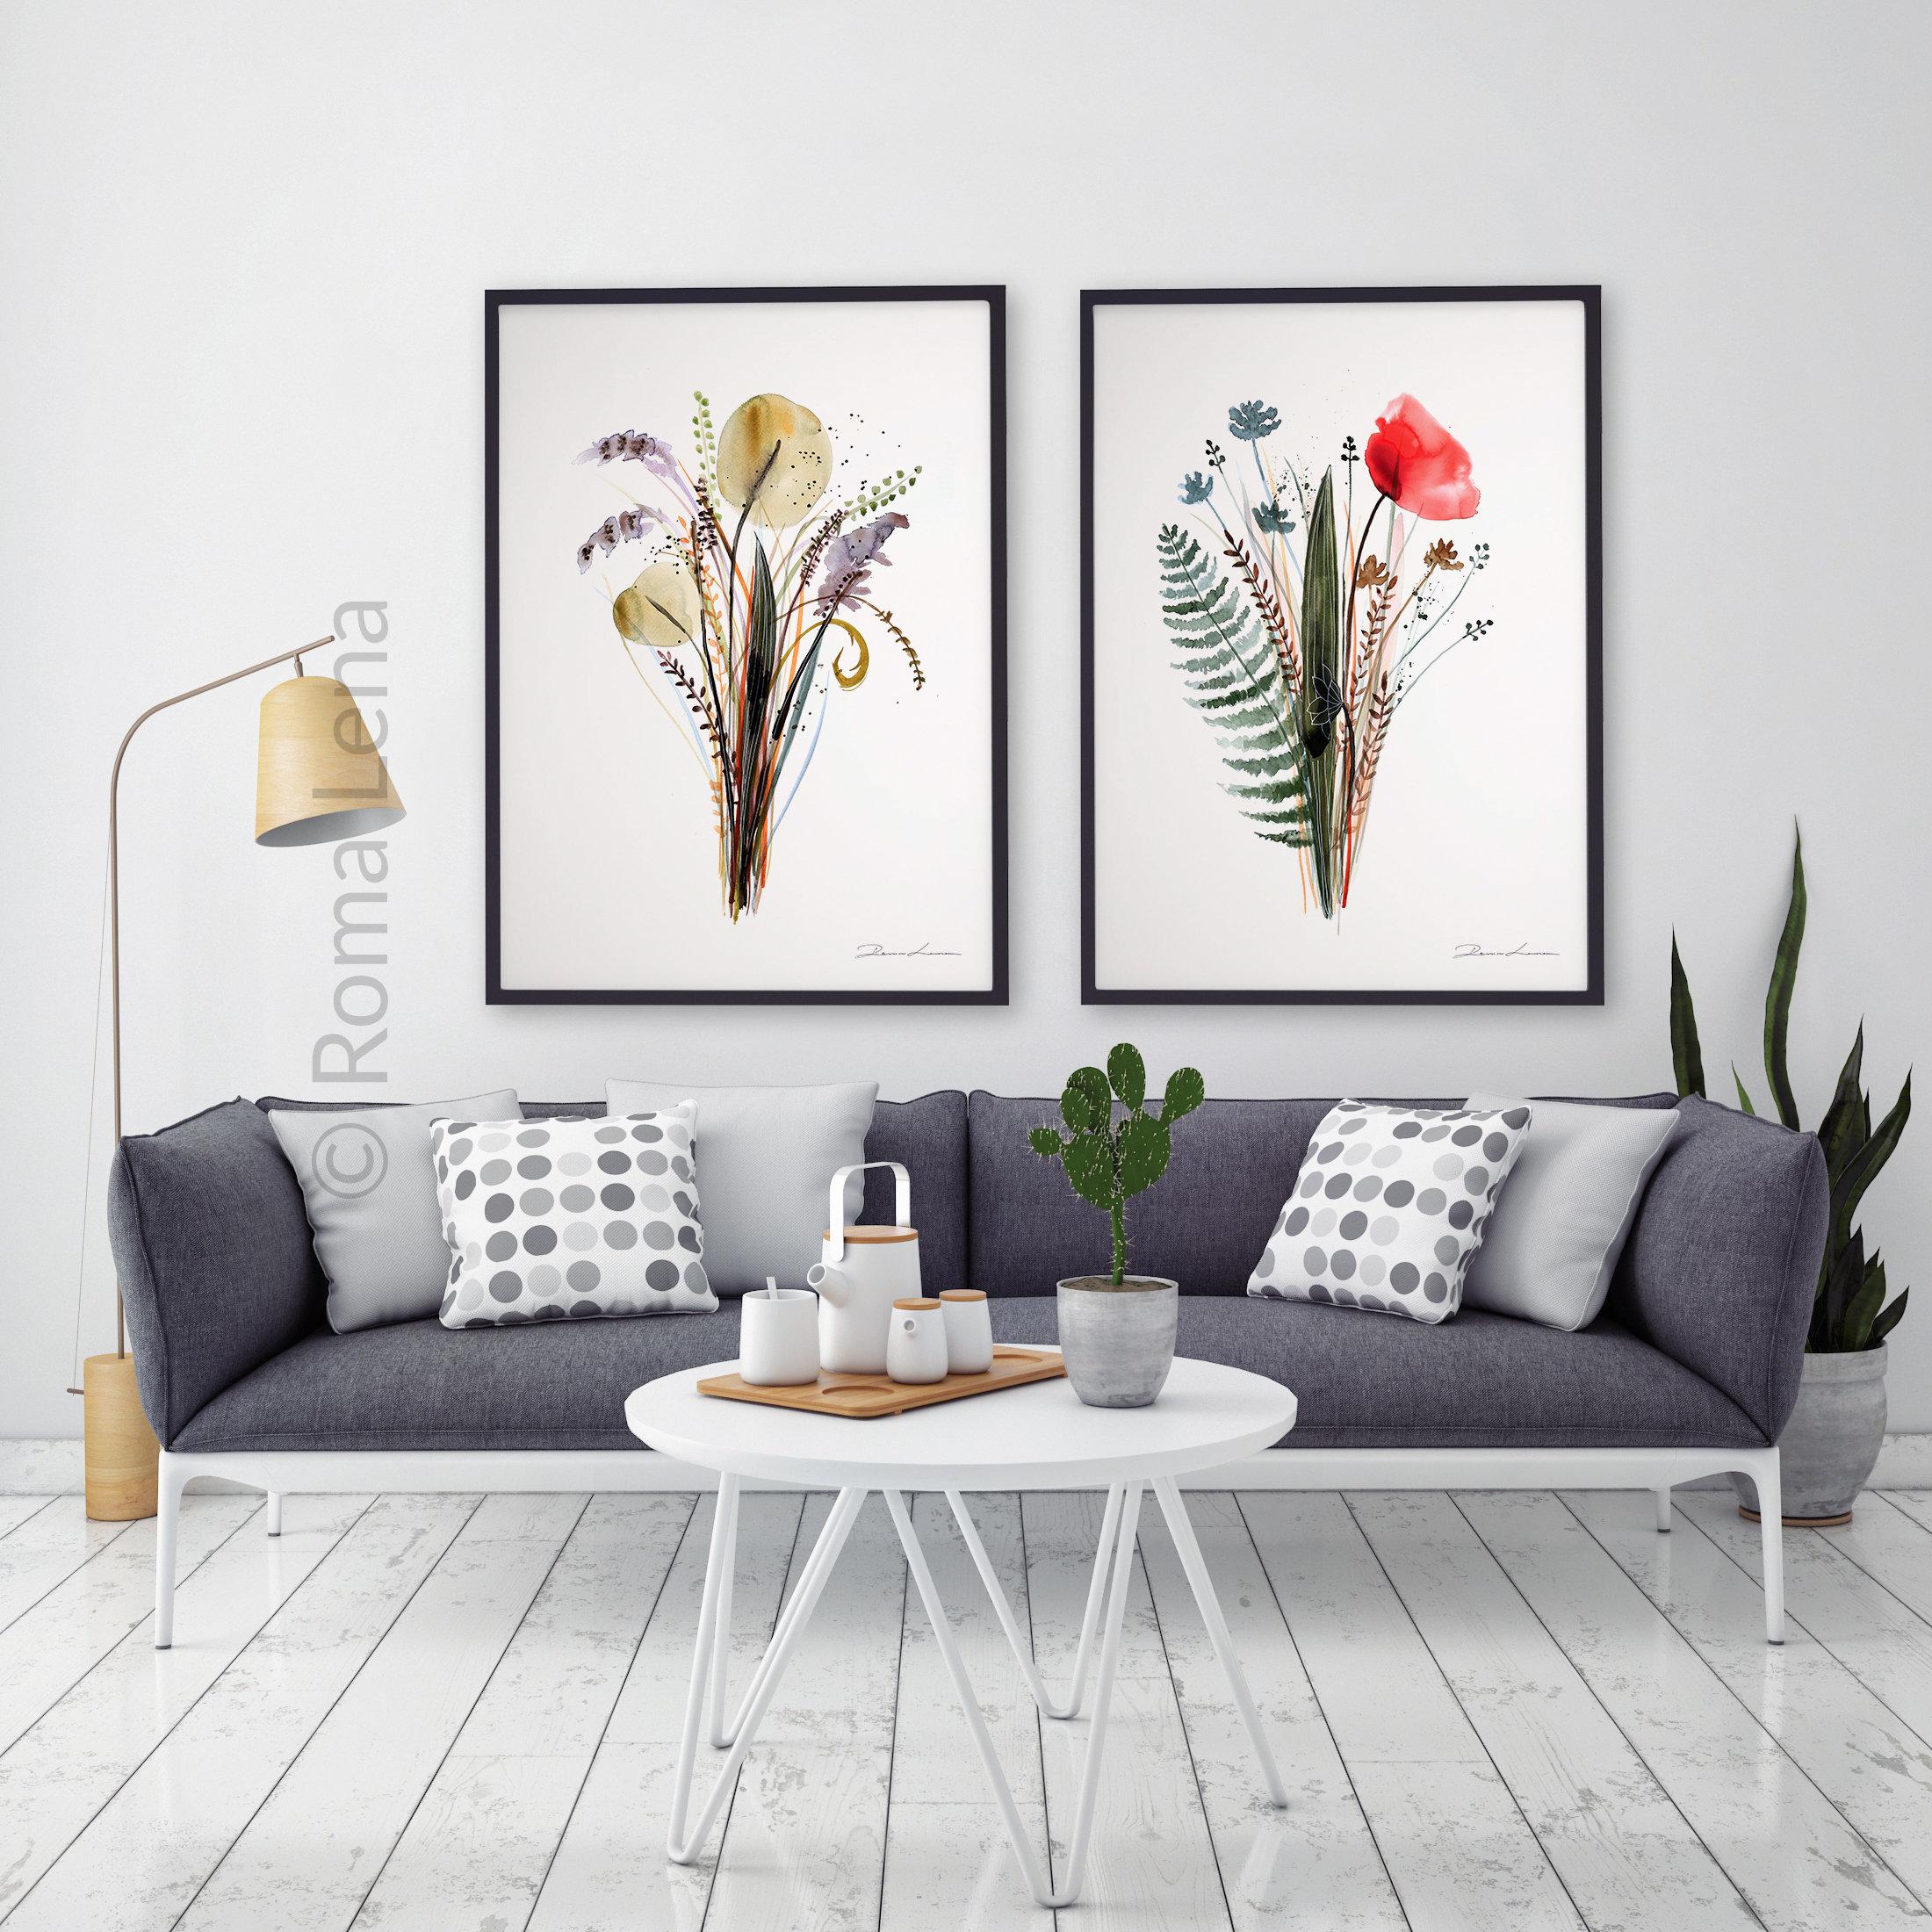 Bohemian Style Decor Boho Room Theme Colorful Flowers Art Flowers Decor Ideas Kitchen Decor Bohemian Wall Art Floral Painting Fine Art